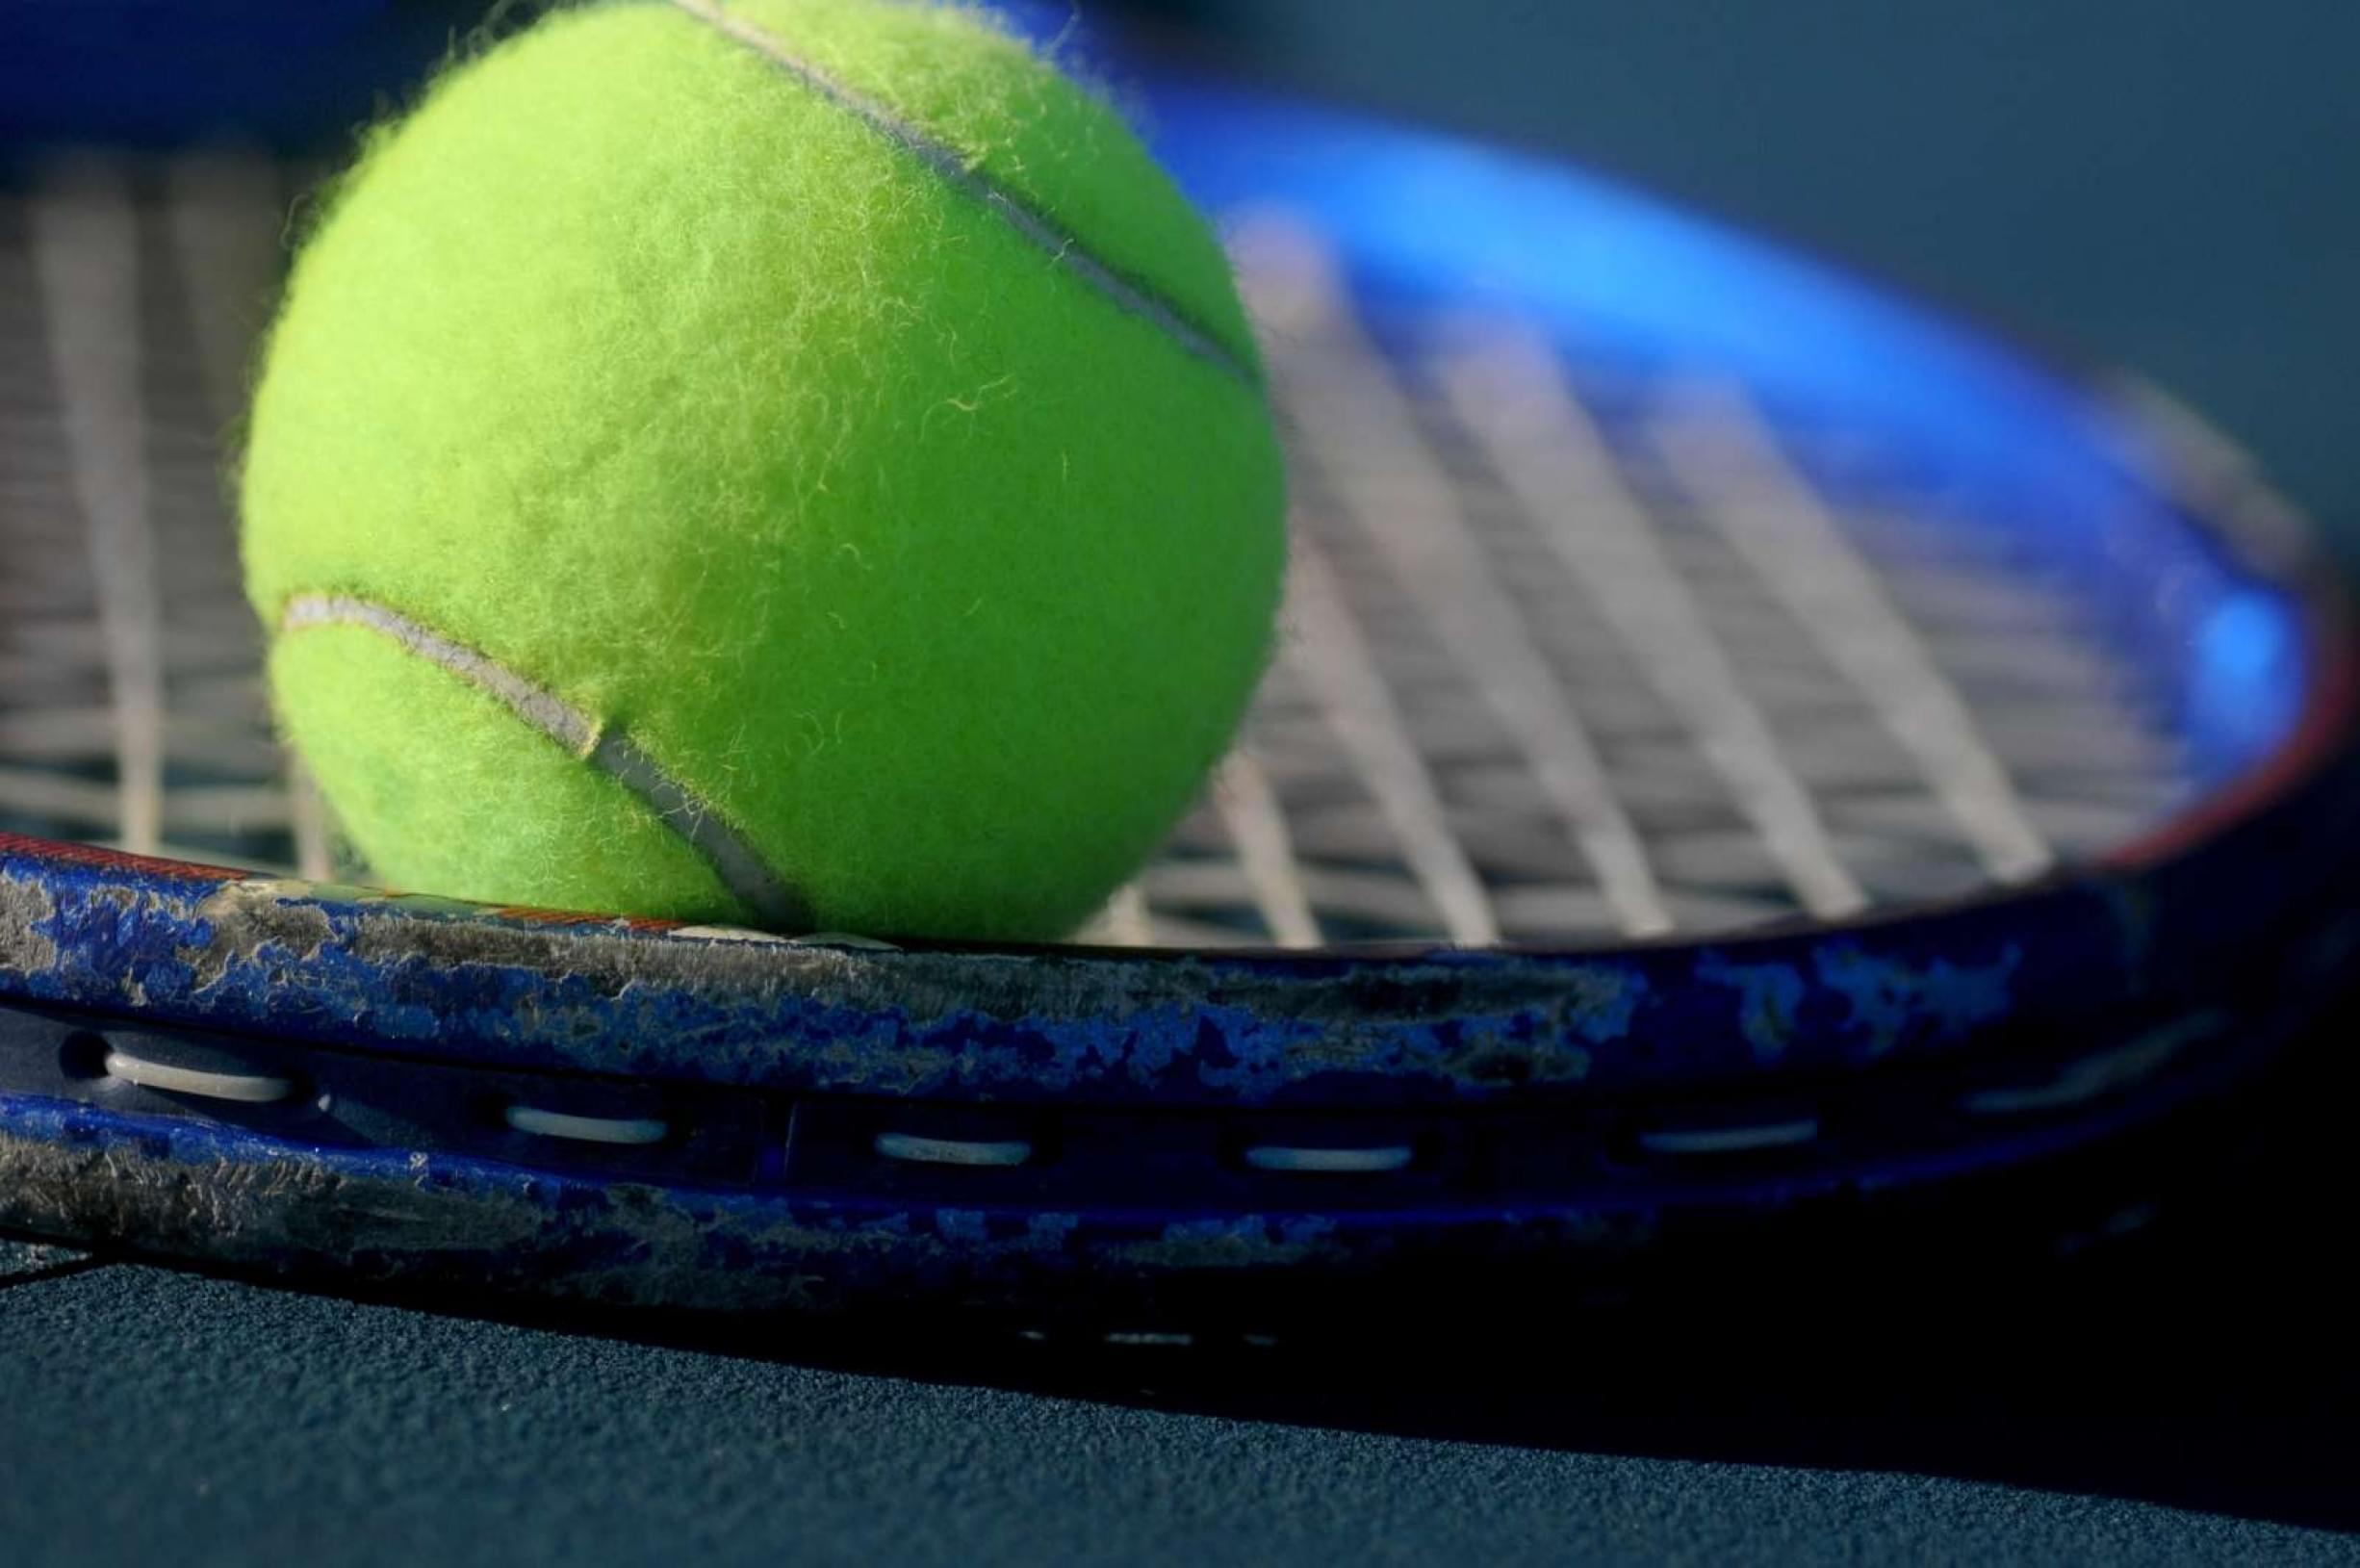 tennisraket